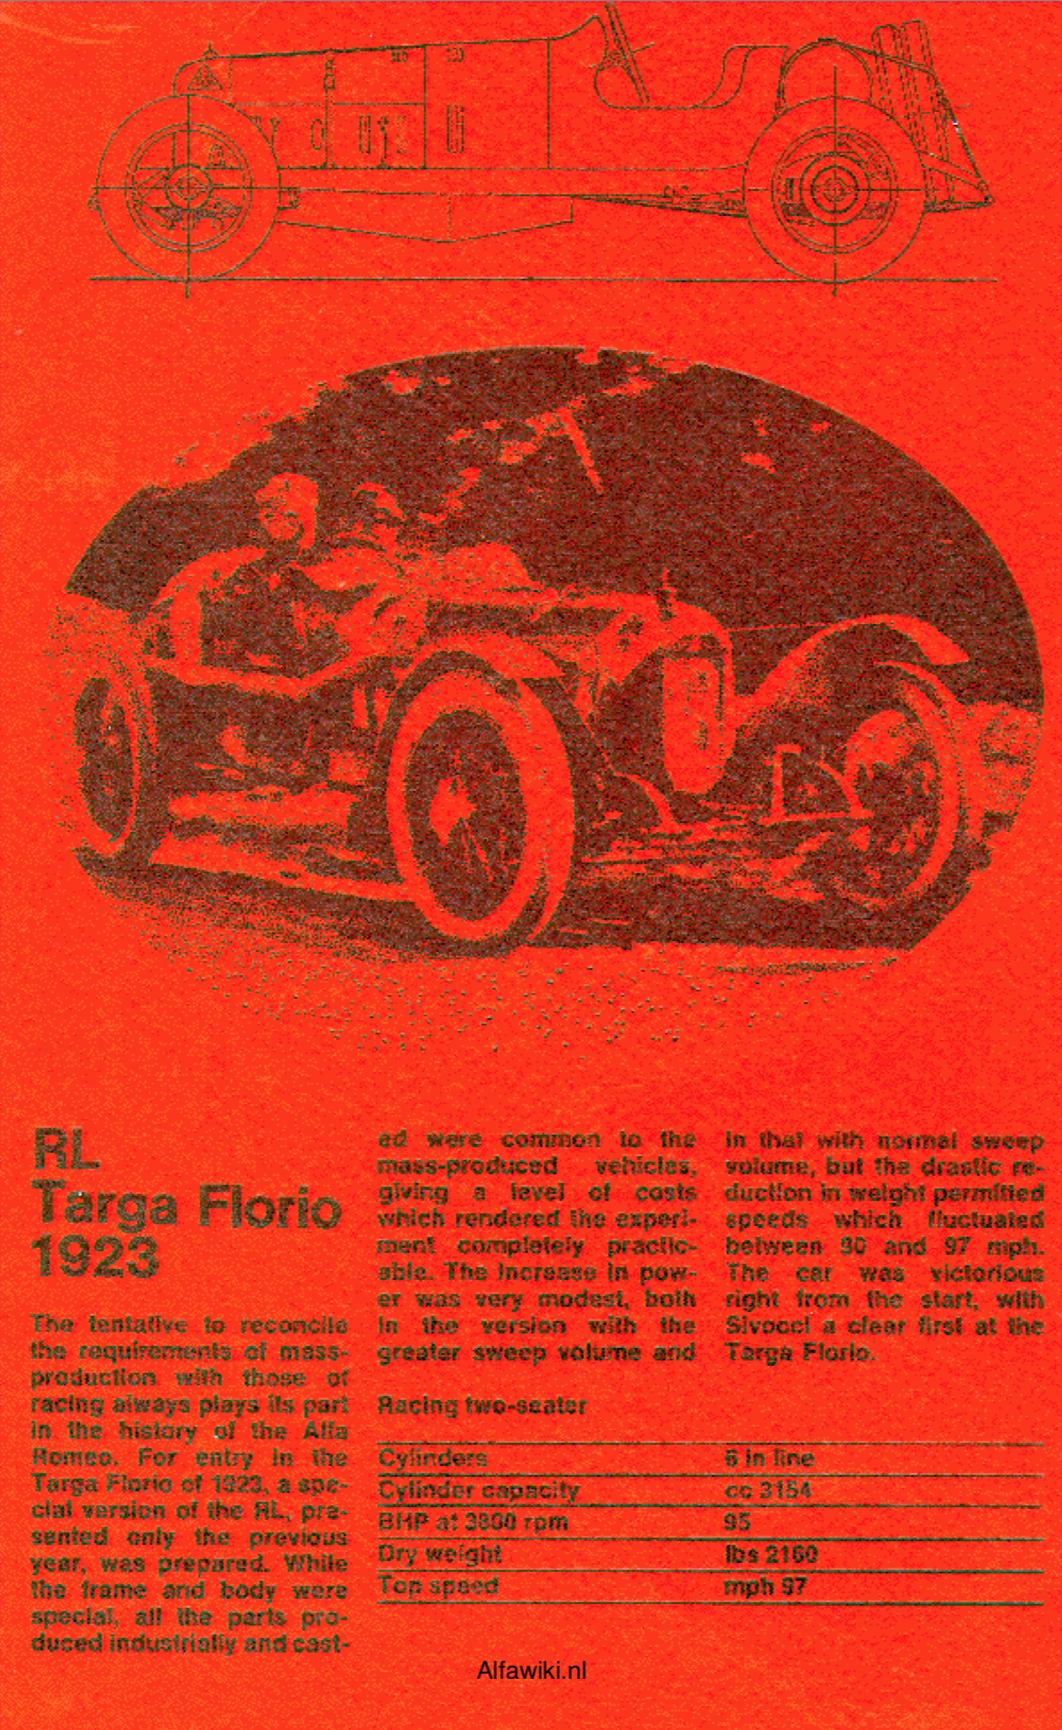 Alfa Romeo RL Targa Florio flyer